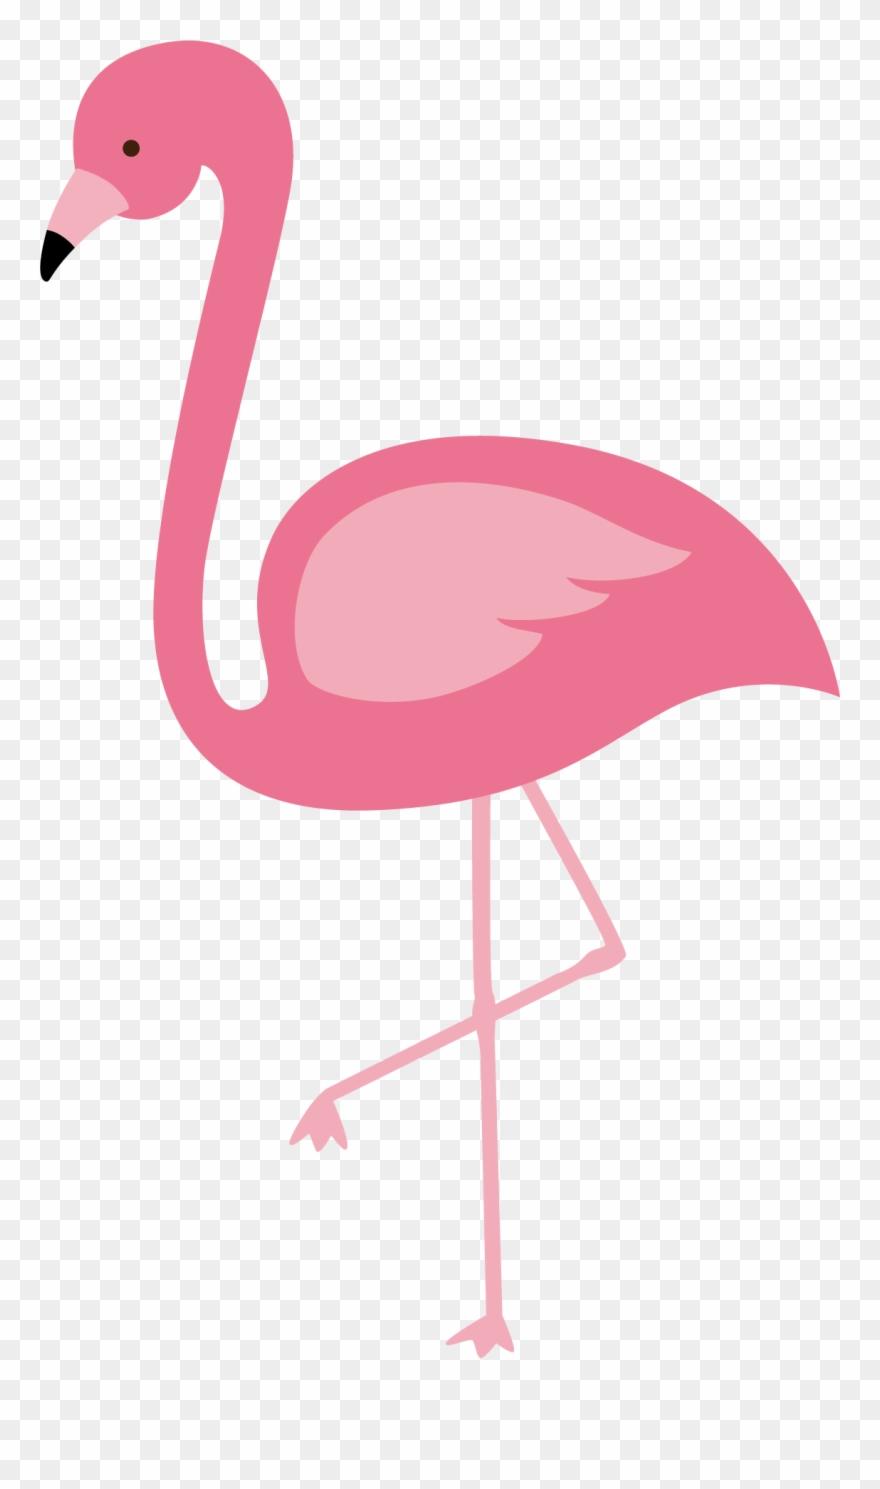 Download Flamingo Clipart Pink Flamingo.